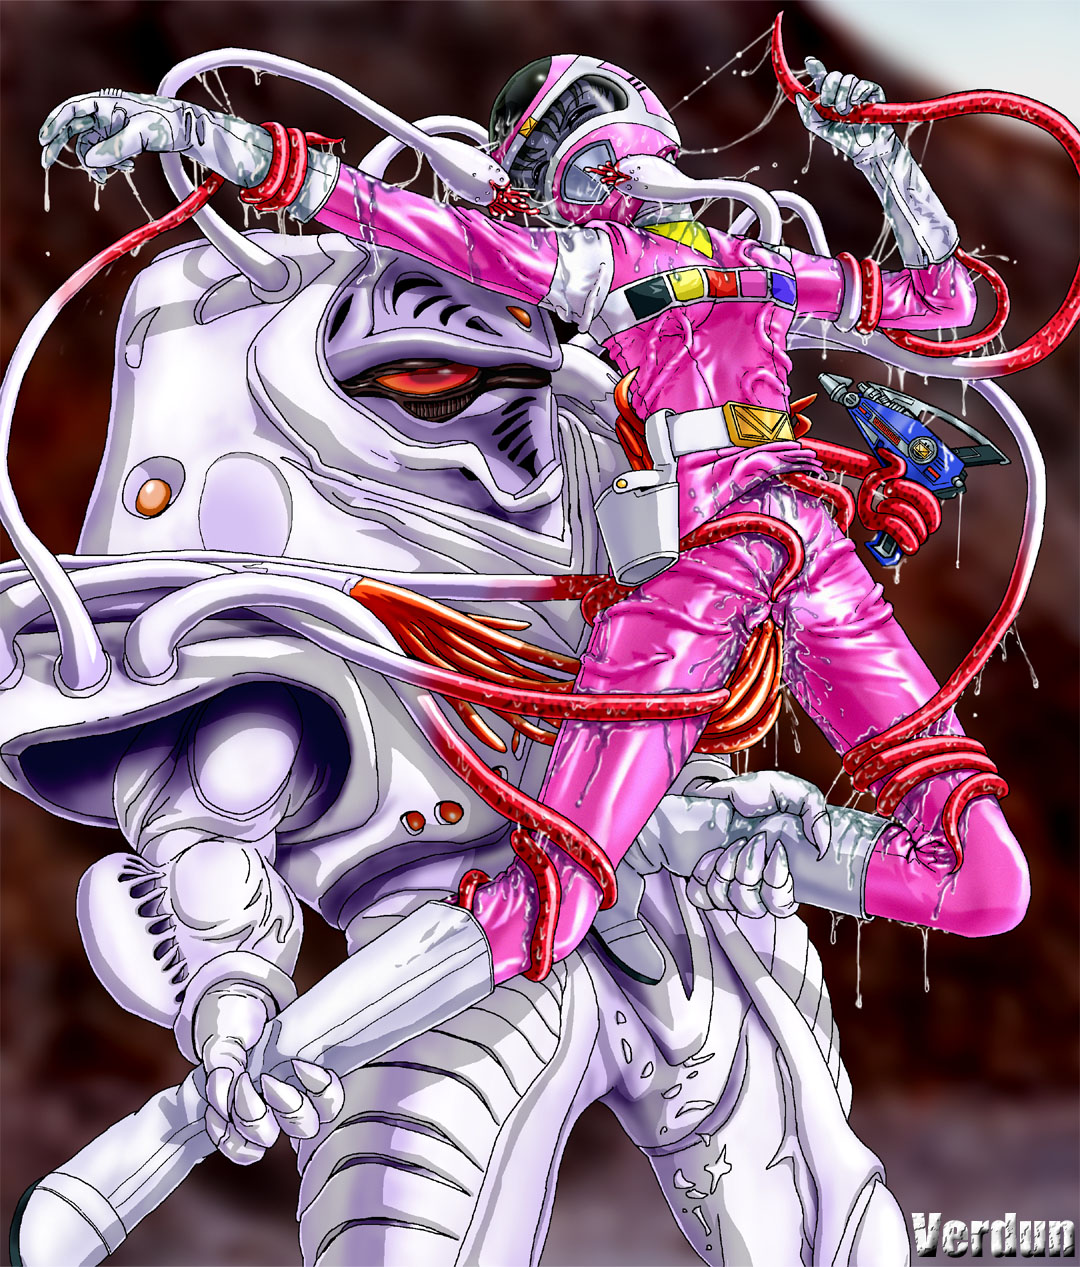 kira rangers power dino thunder Ghost in the shell borma